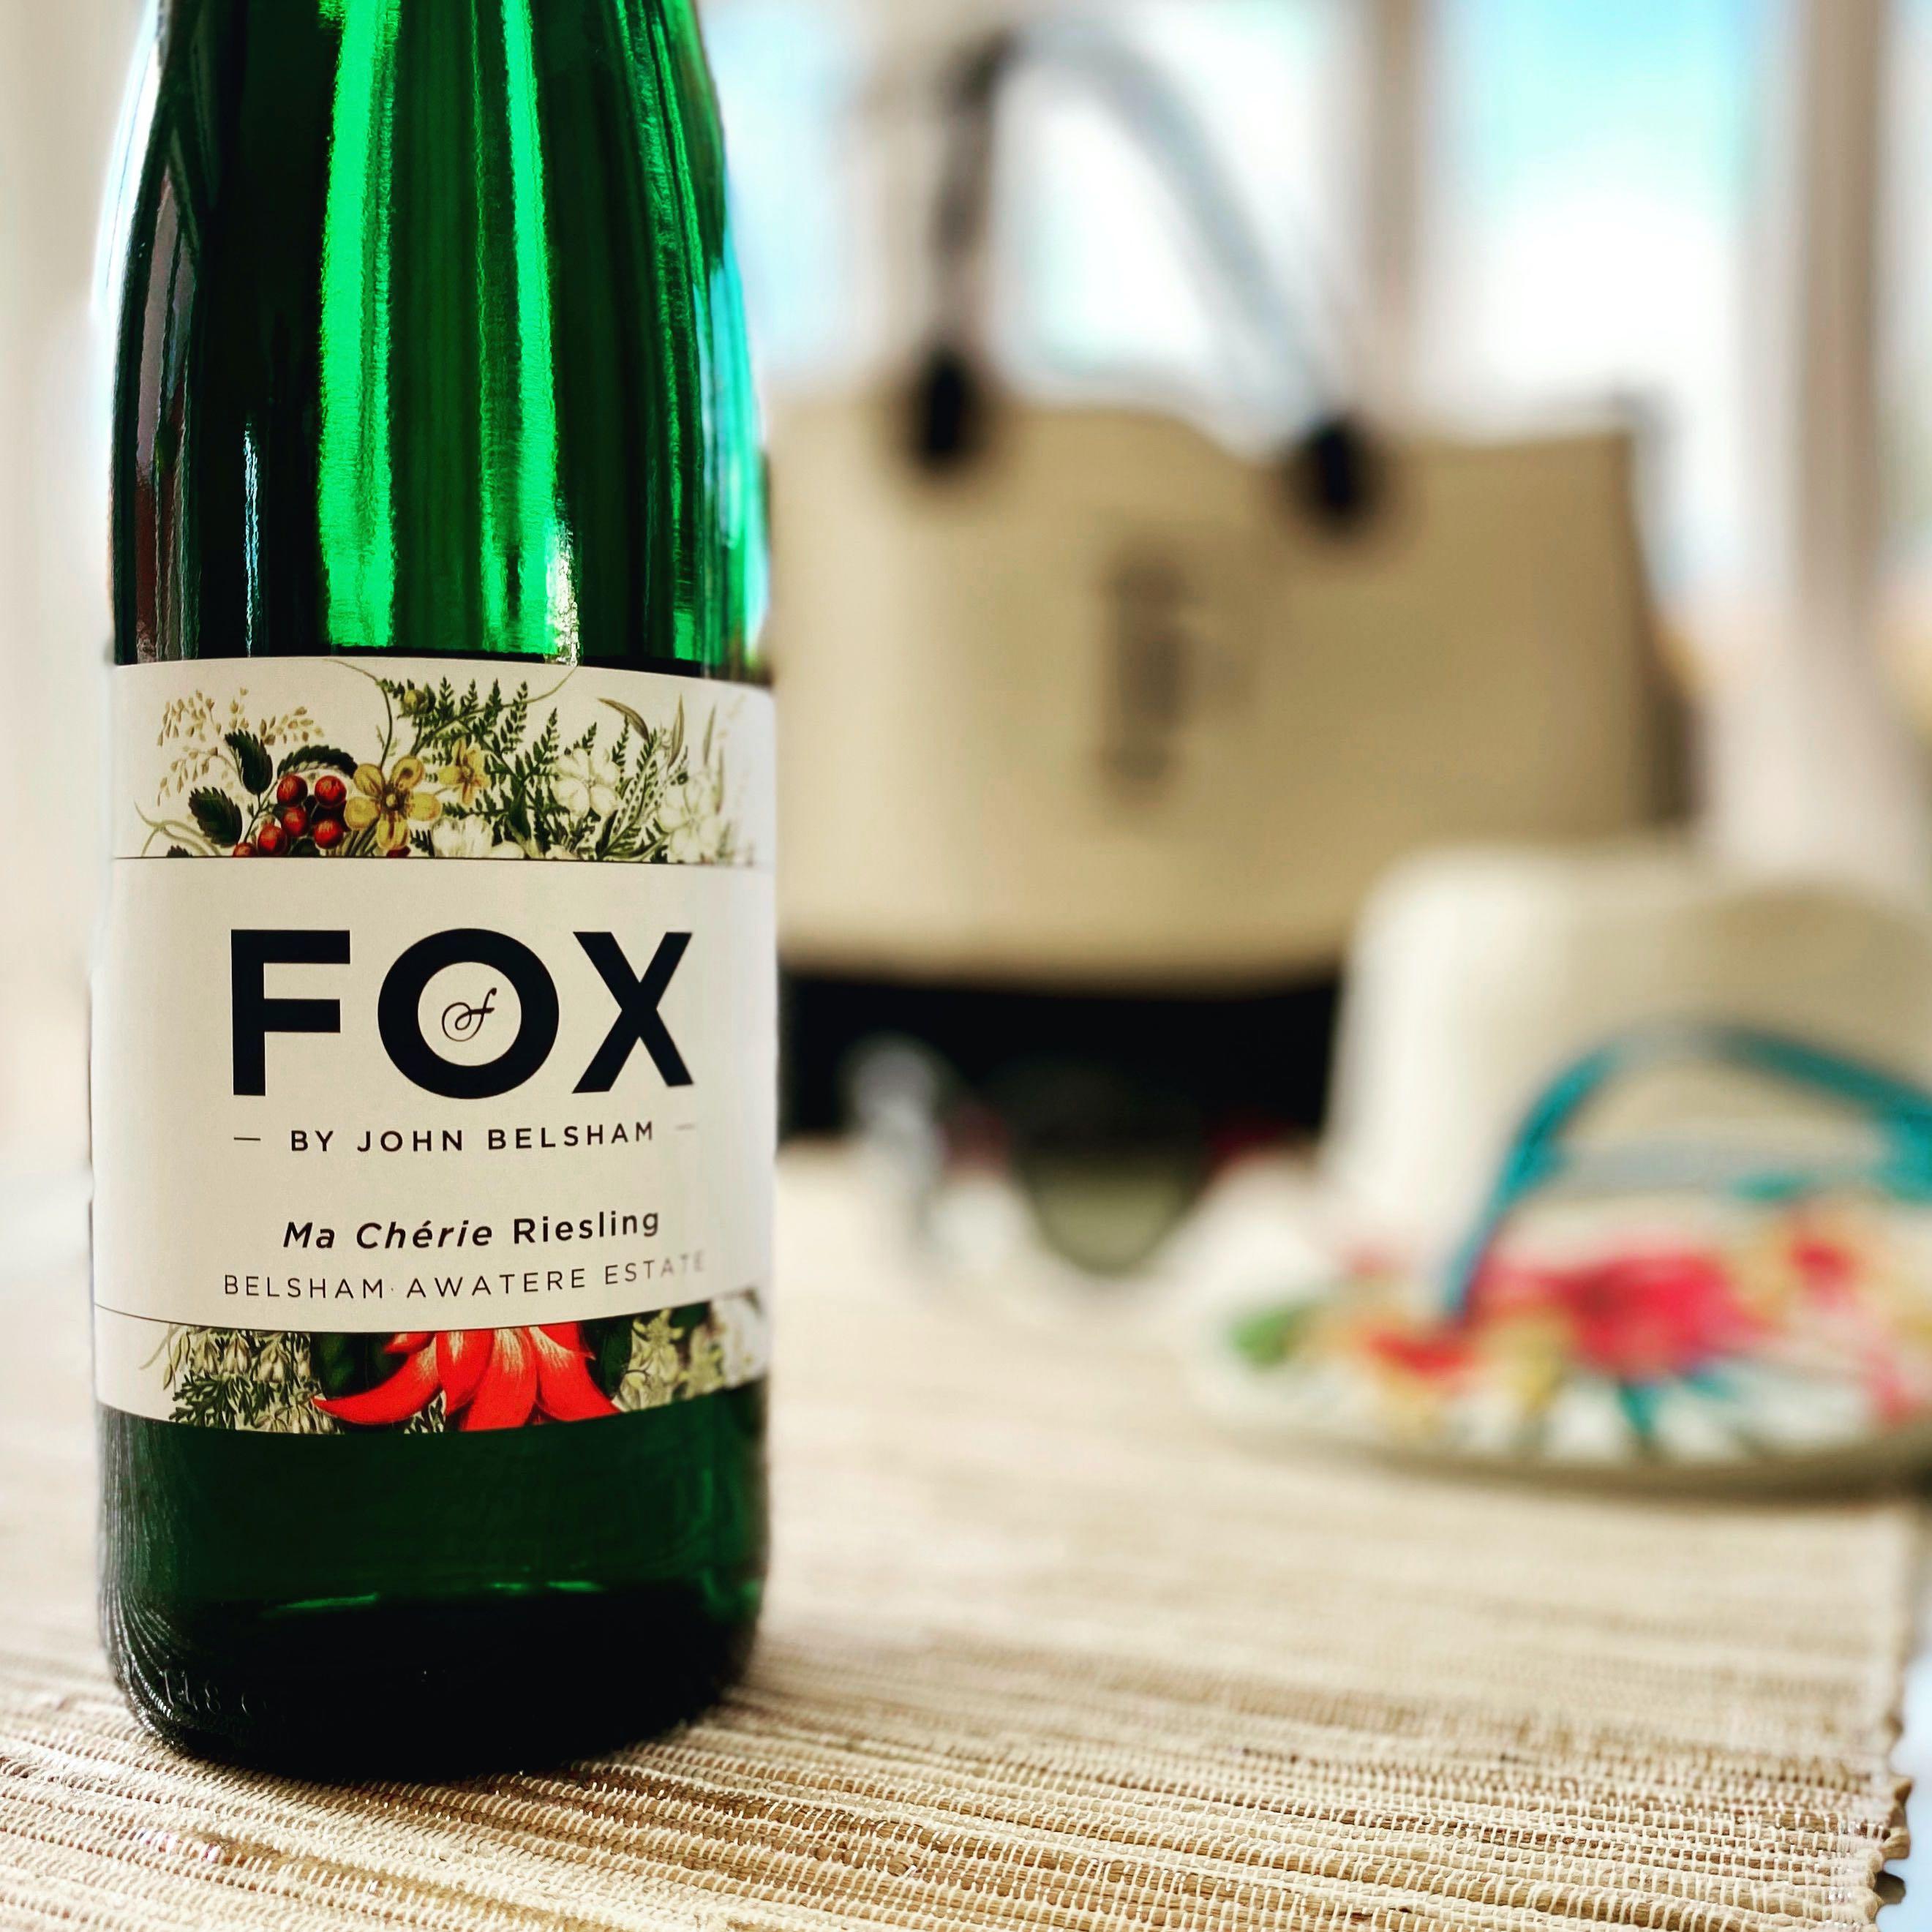 Fox ma chérie Riesling